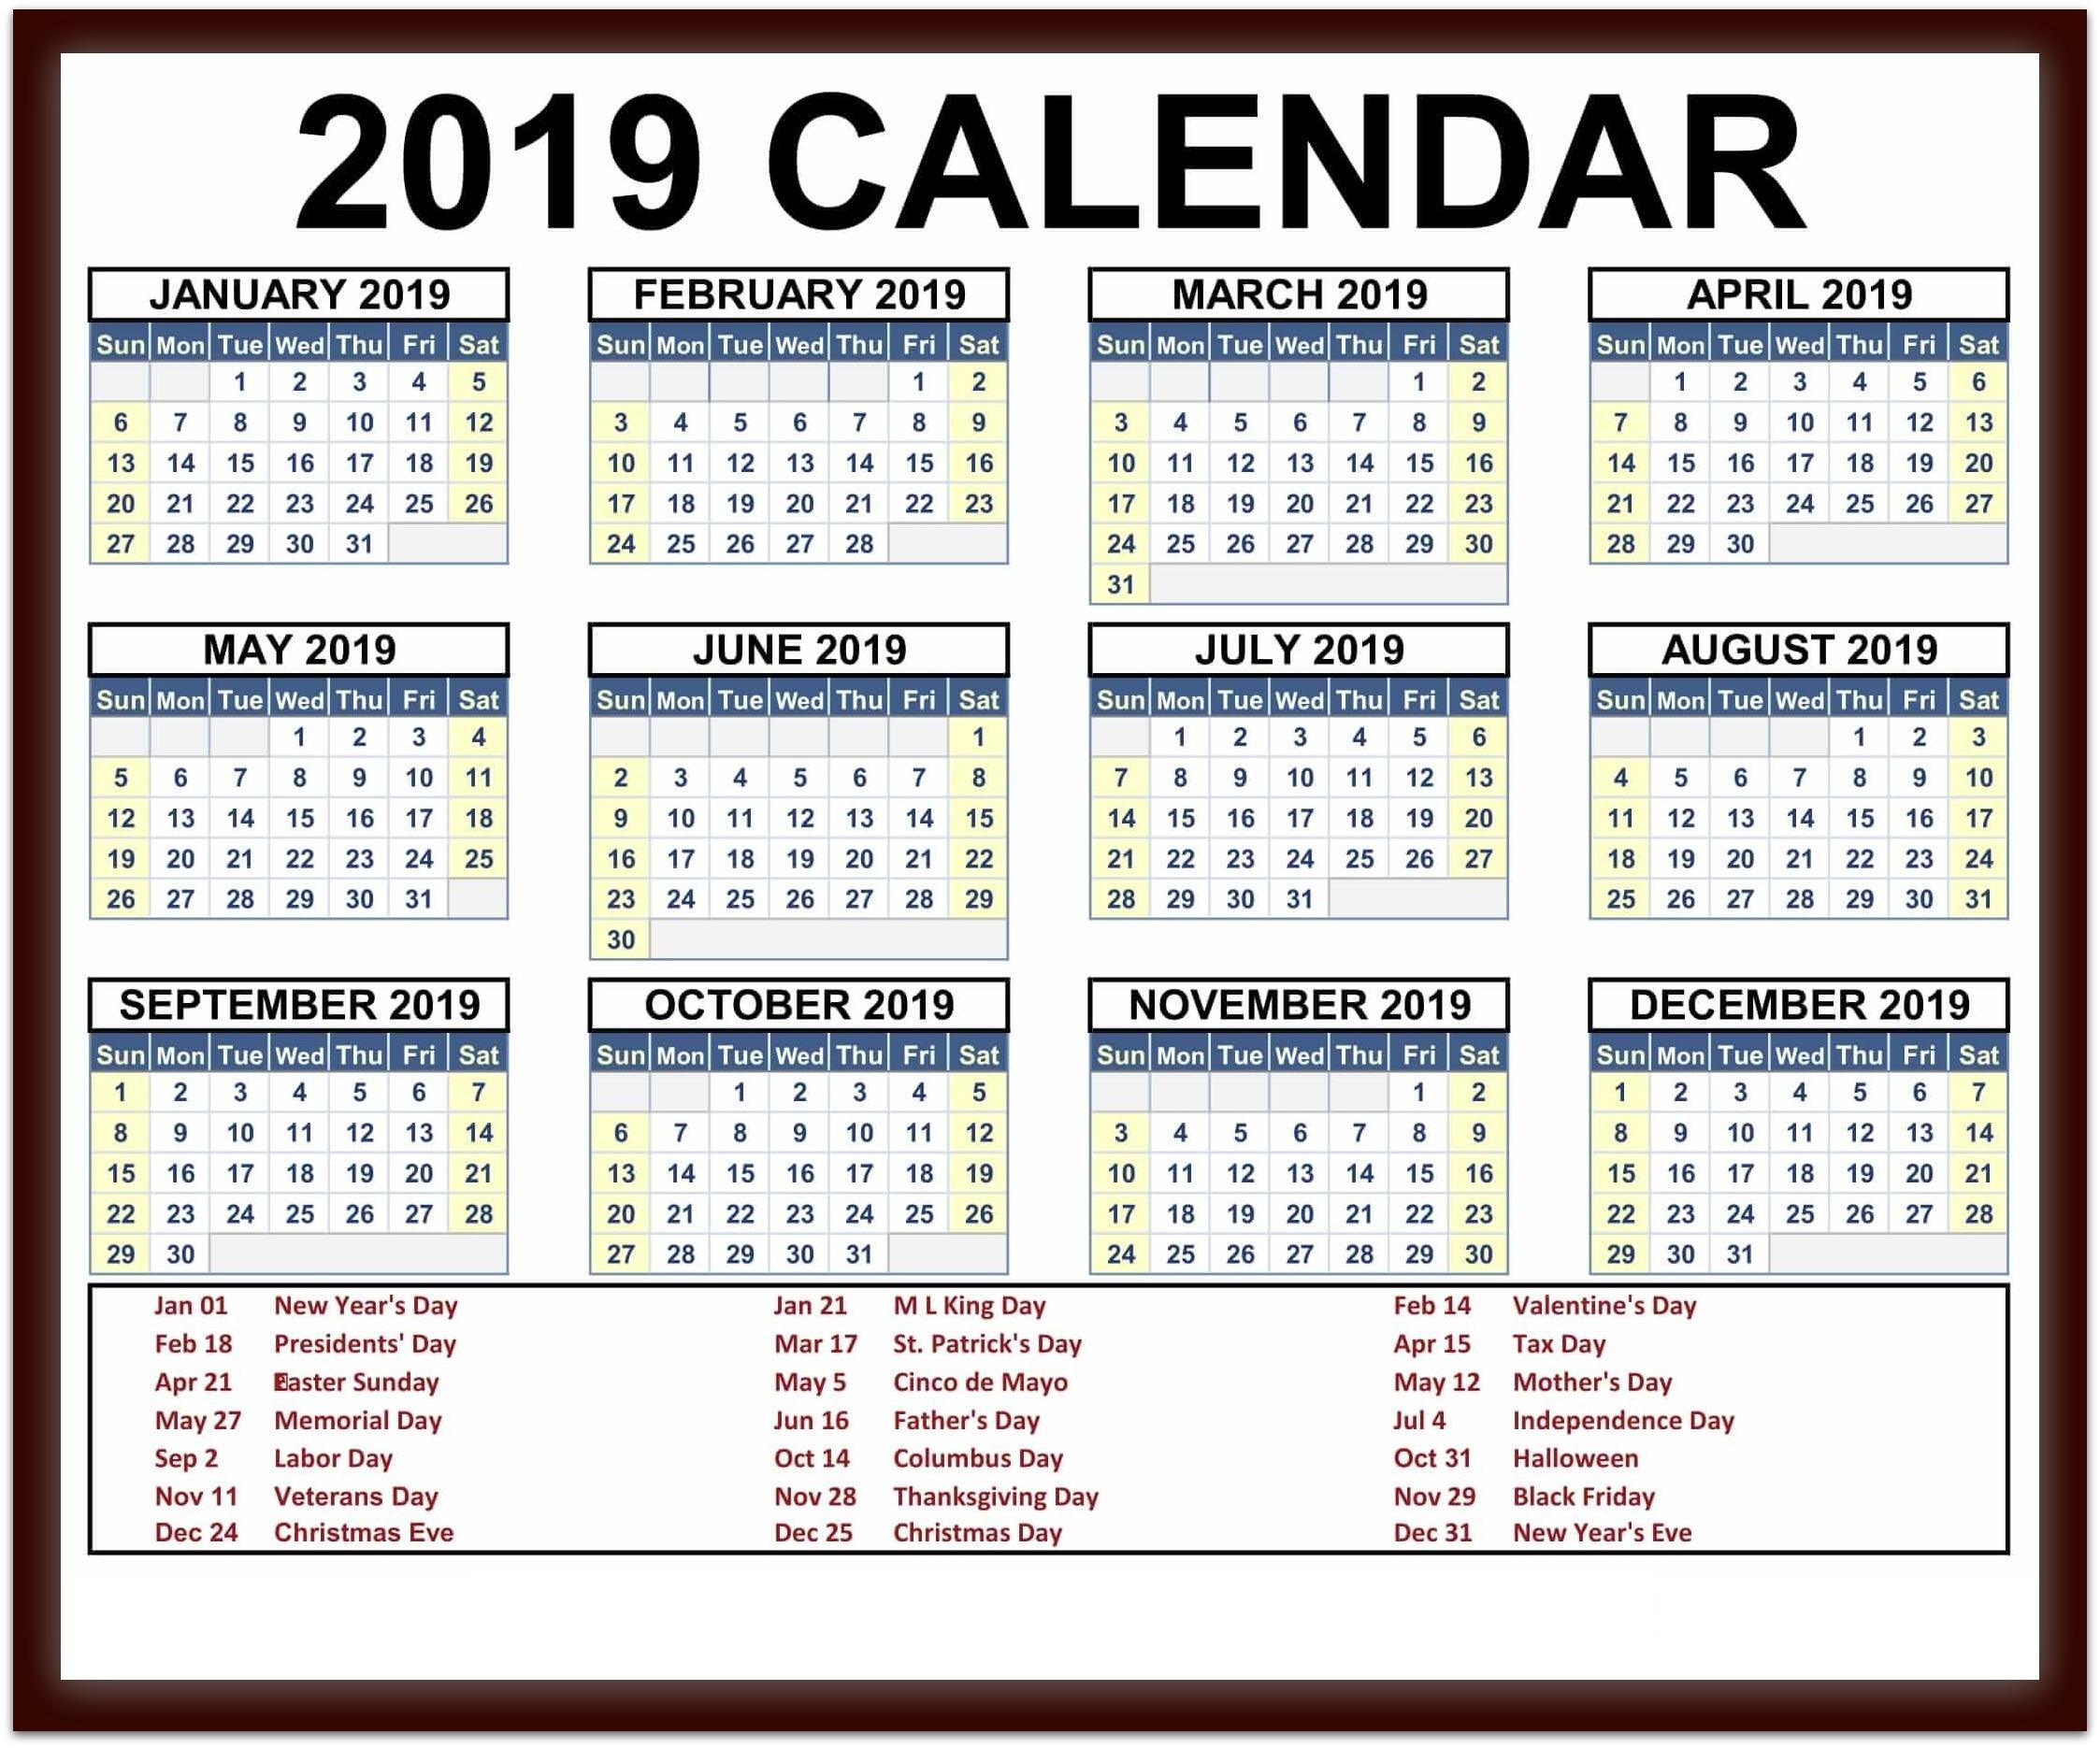 2019 Calendar Printable Word